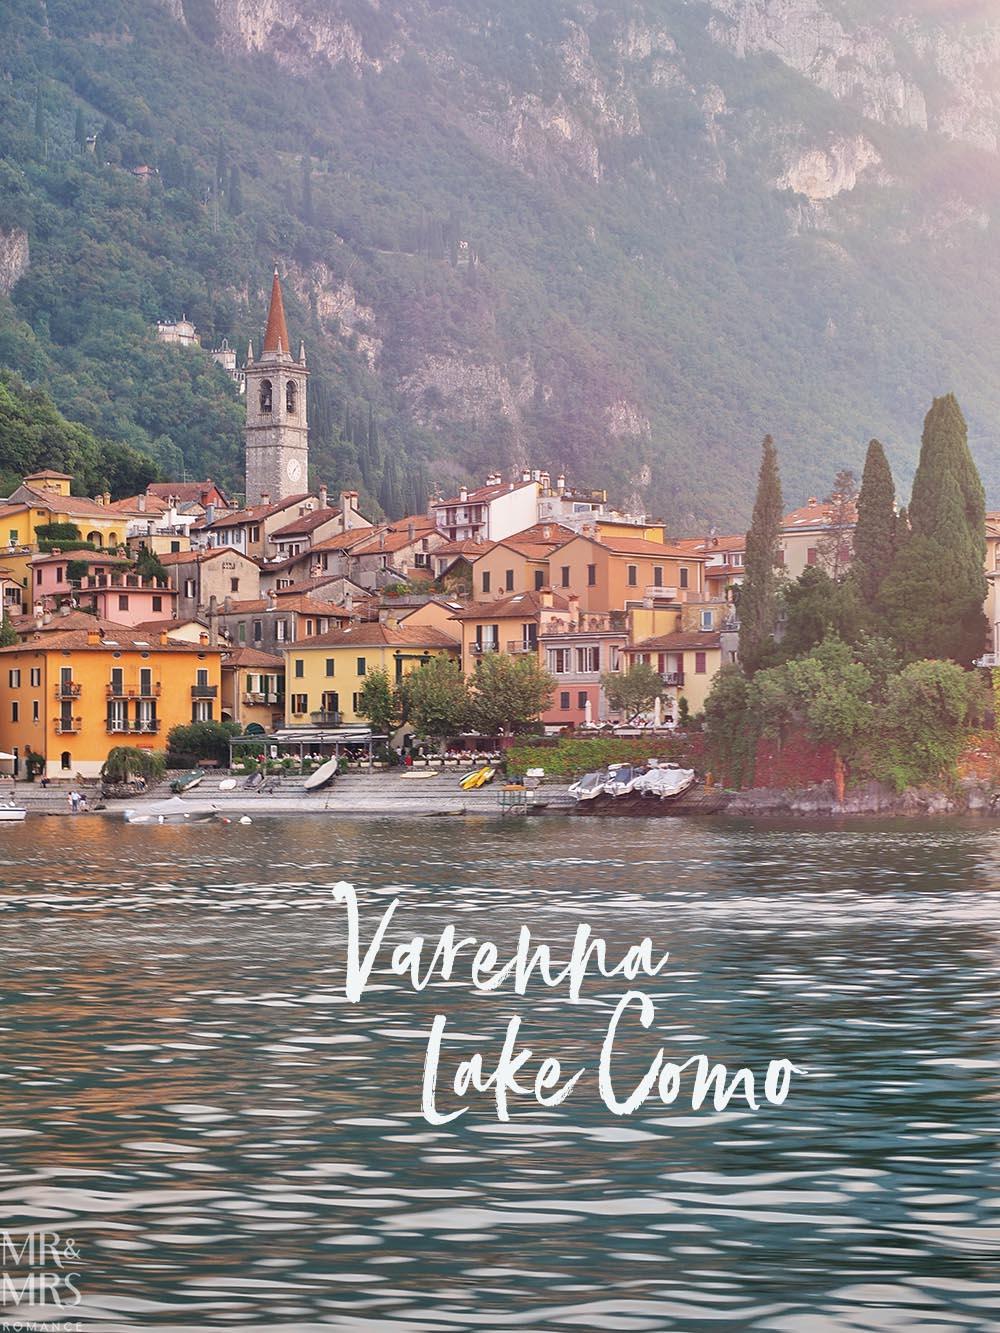 Lake Como private boat tour - Varenna